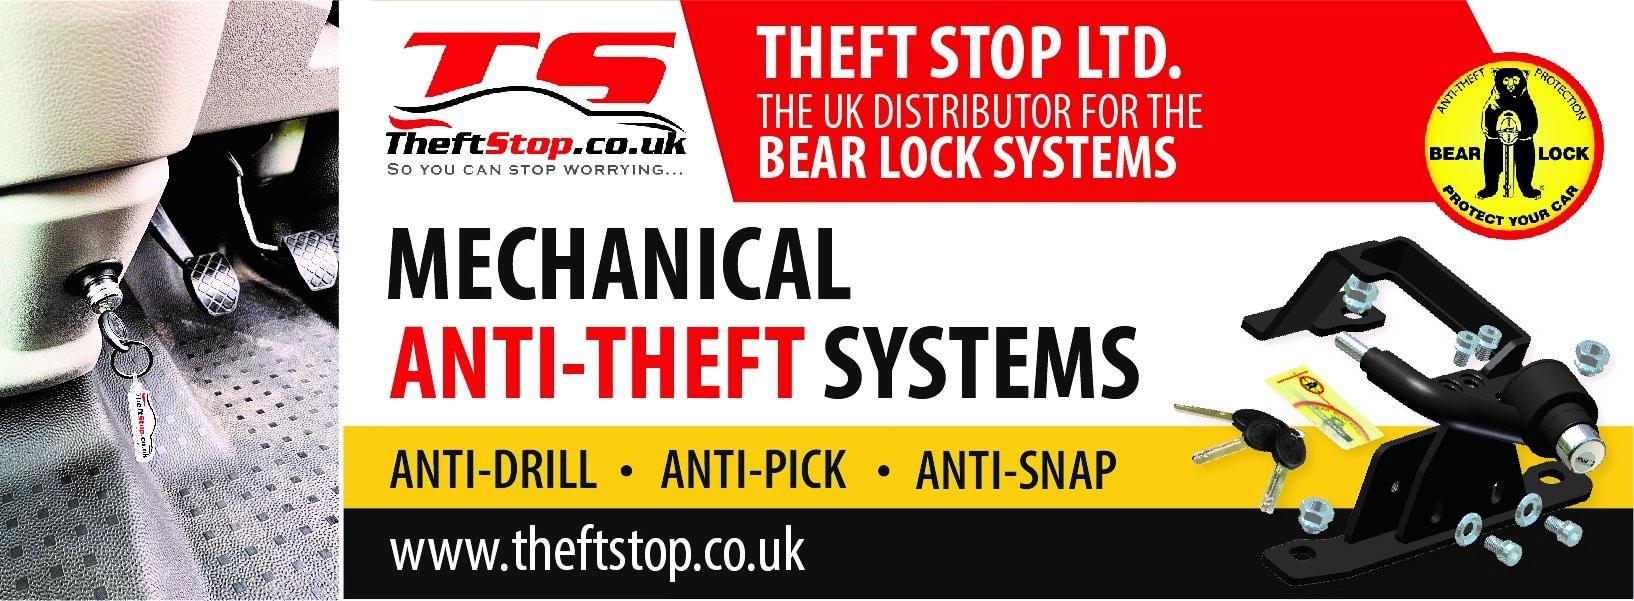 Theft Stop Ltd